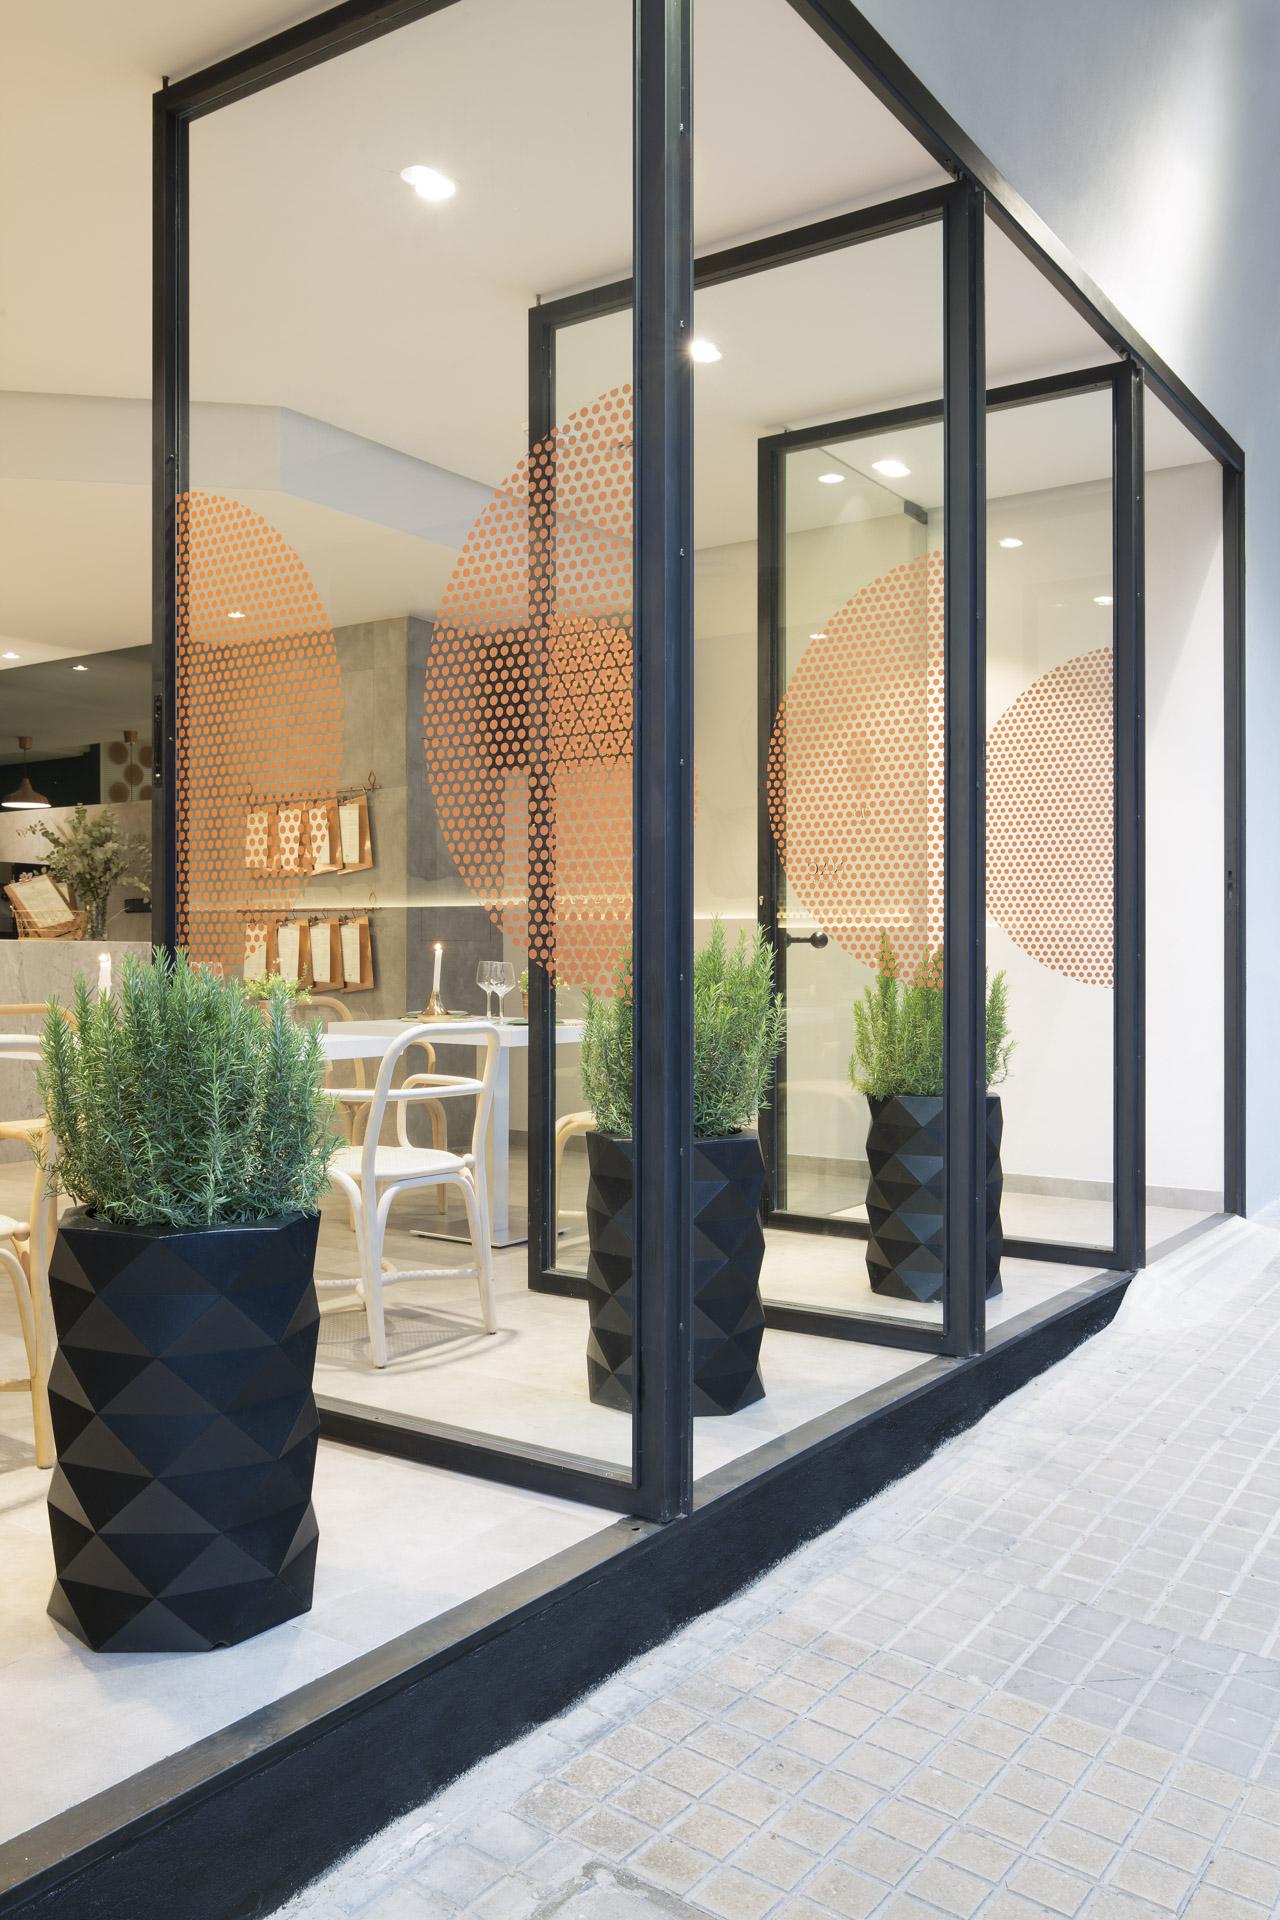 fotografia-arquitectura-valencia-german-cabo-estudihac-restaurante-nac-ontinyent-04